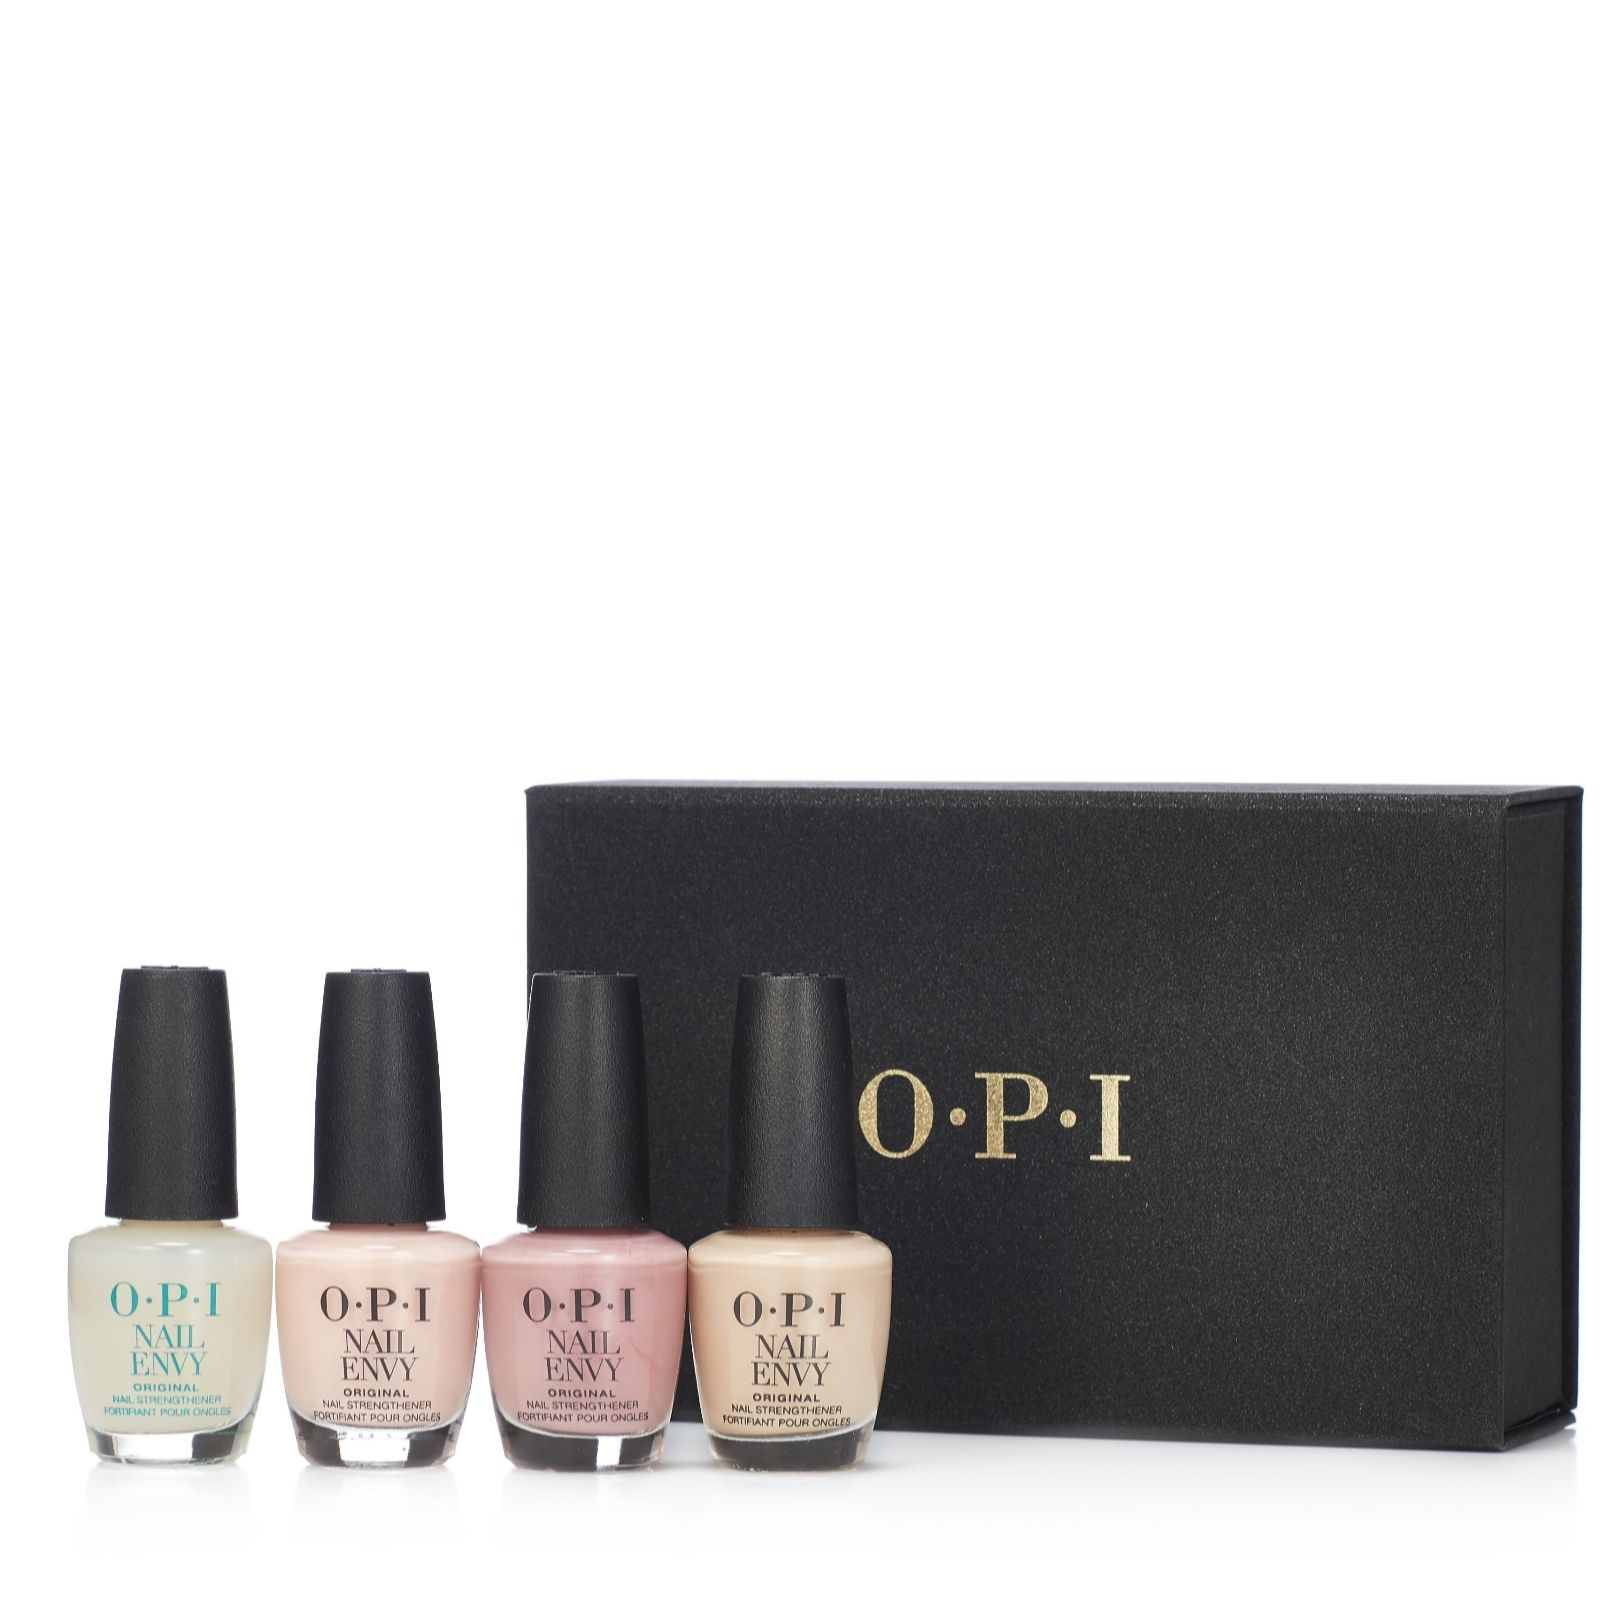 OPI 4 Piece Nail Envy Wardrobe In Gift Box - QVC UK